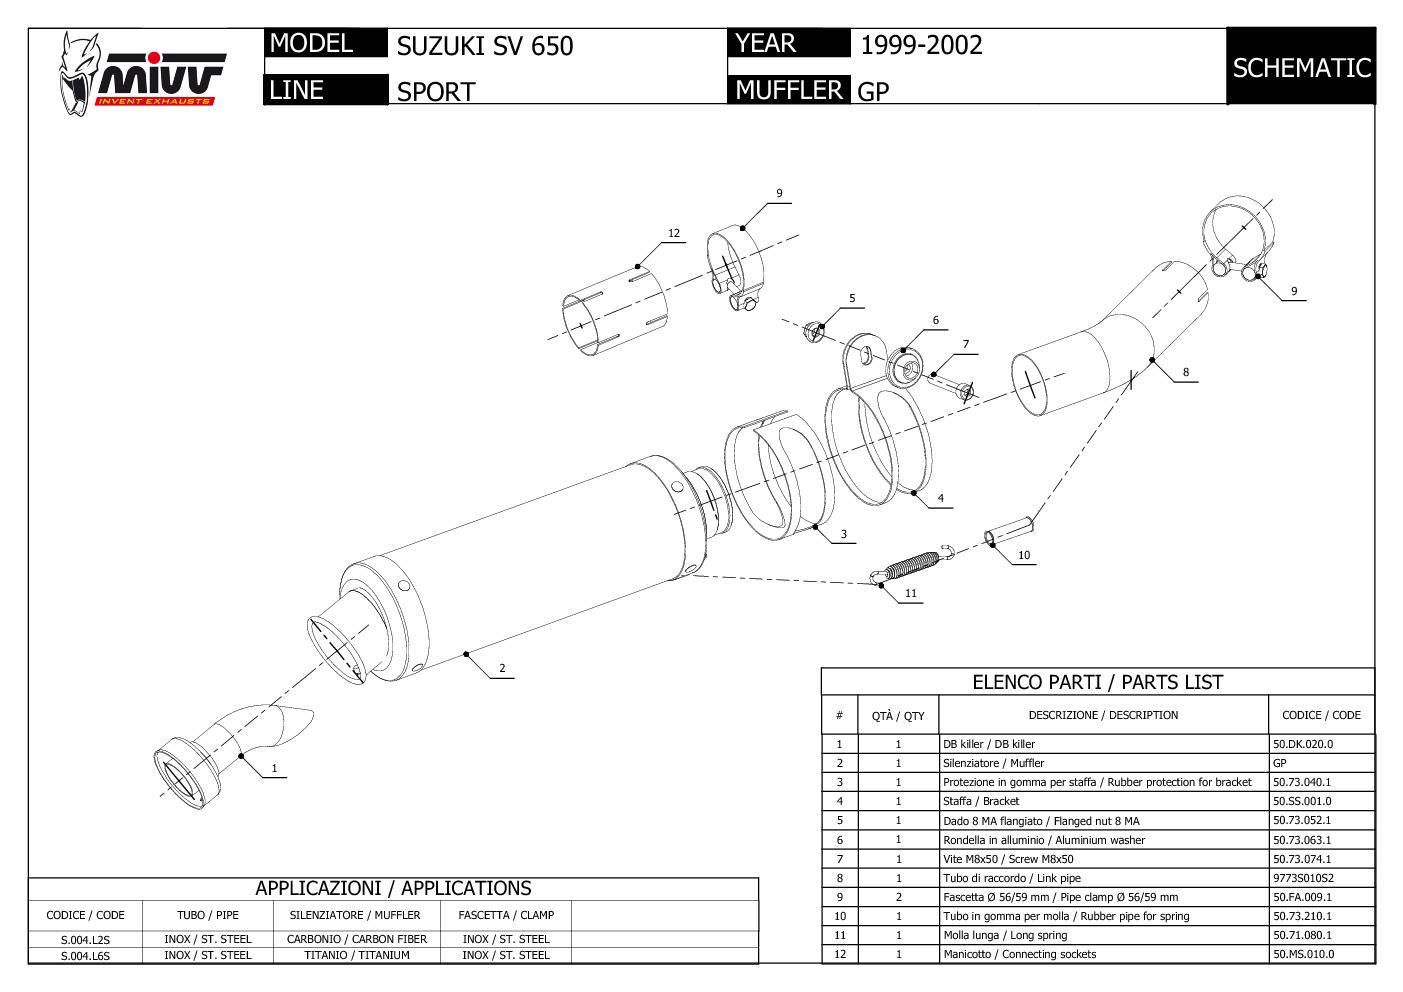 Mivv Exhaust Muffler GP Carbon Fiber for Suzuki Sv 650